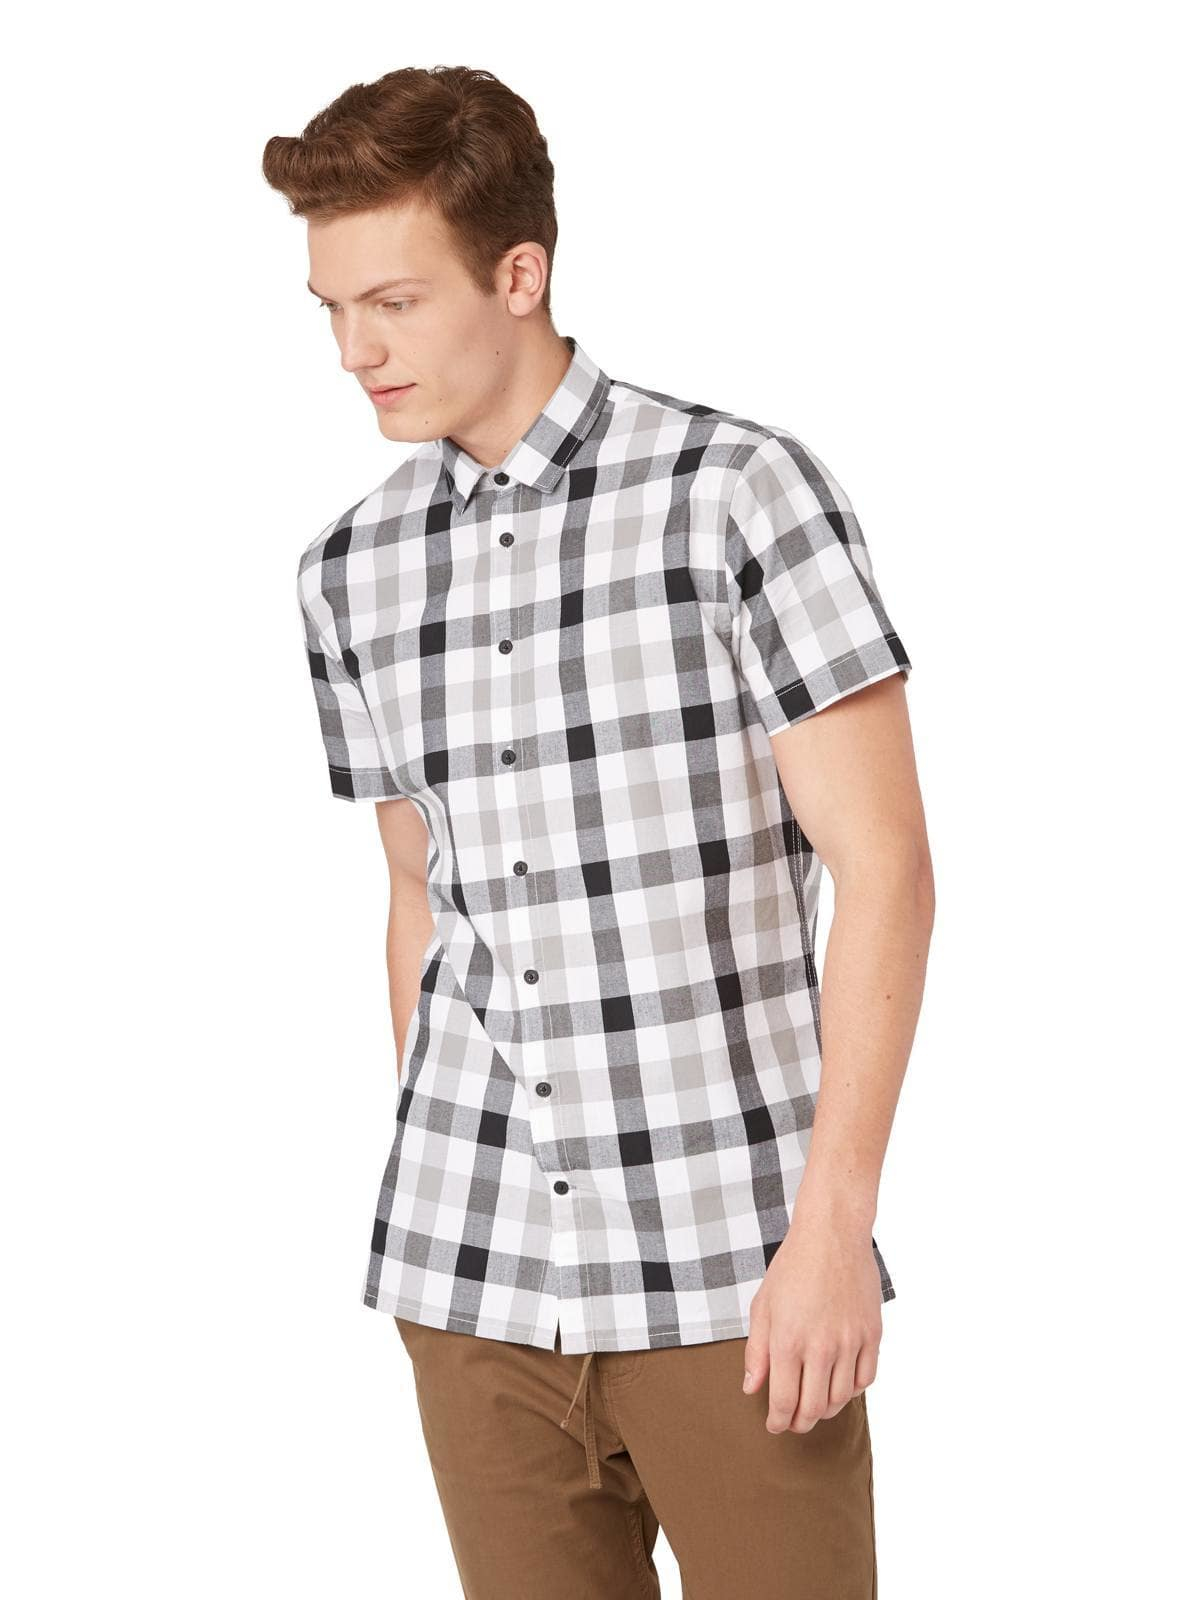 Frank oak large gingham short sleeve shirt in grey in for Frank and oak shirt